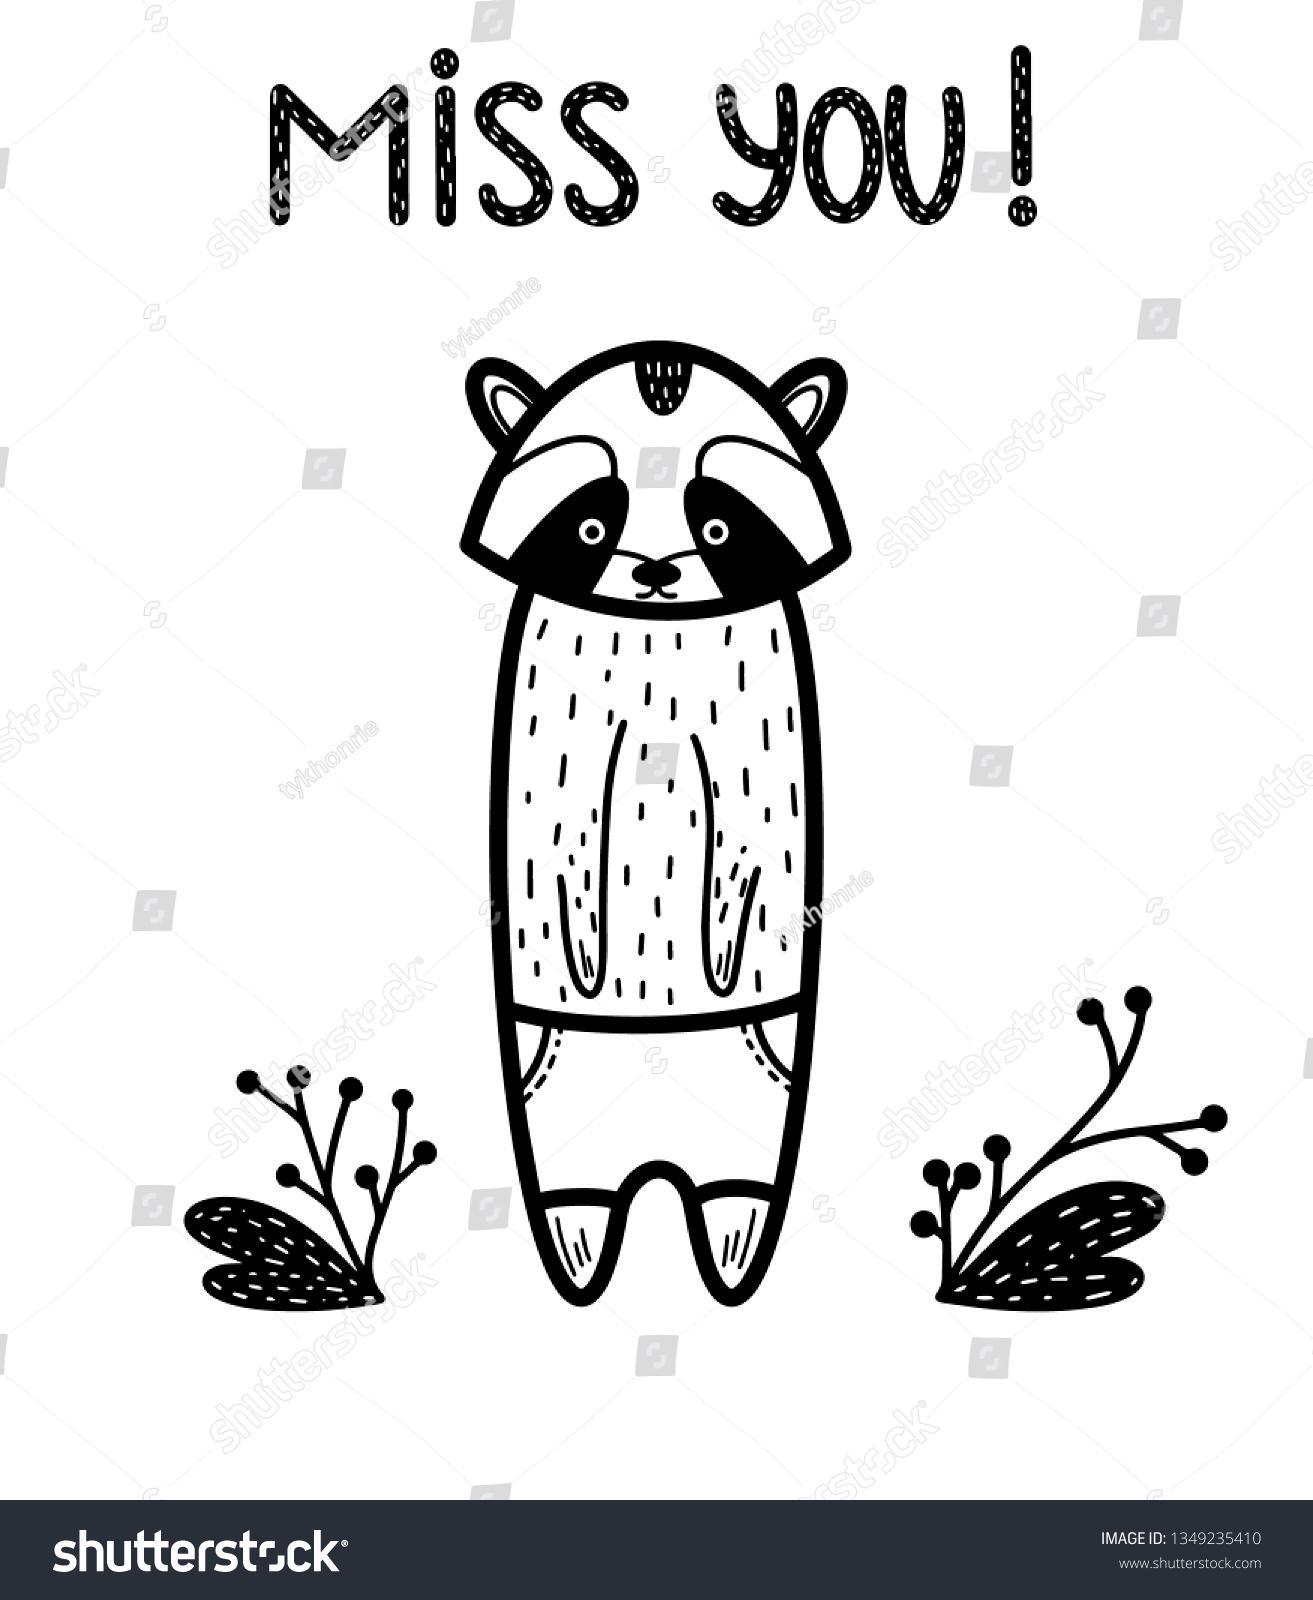 stock-vector-miss-you-raccoon-black-bann